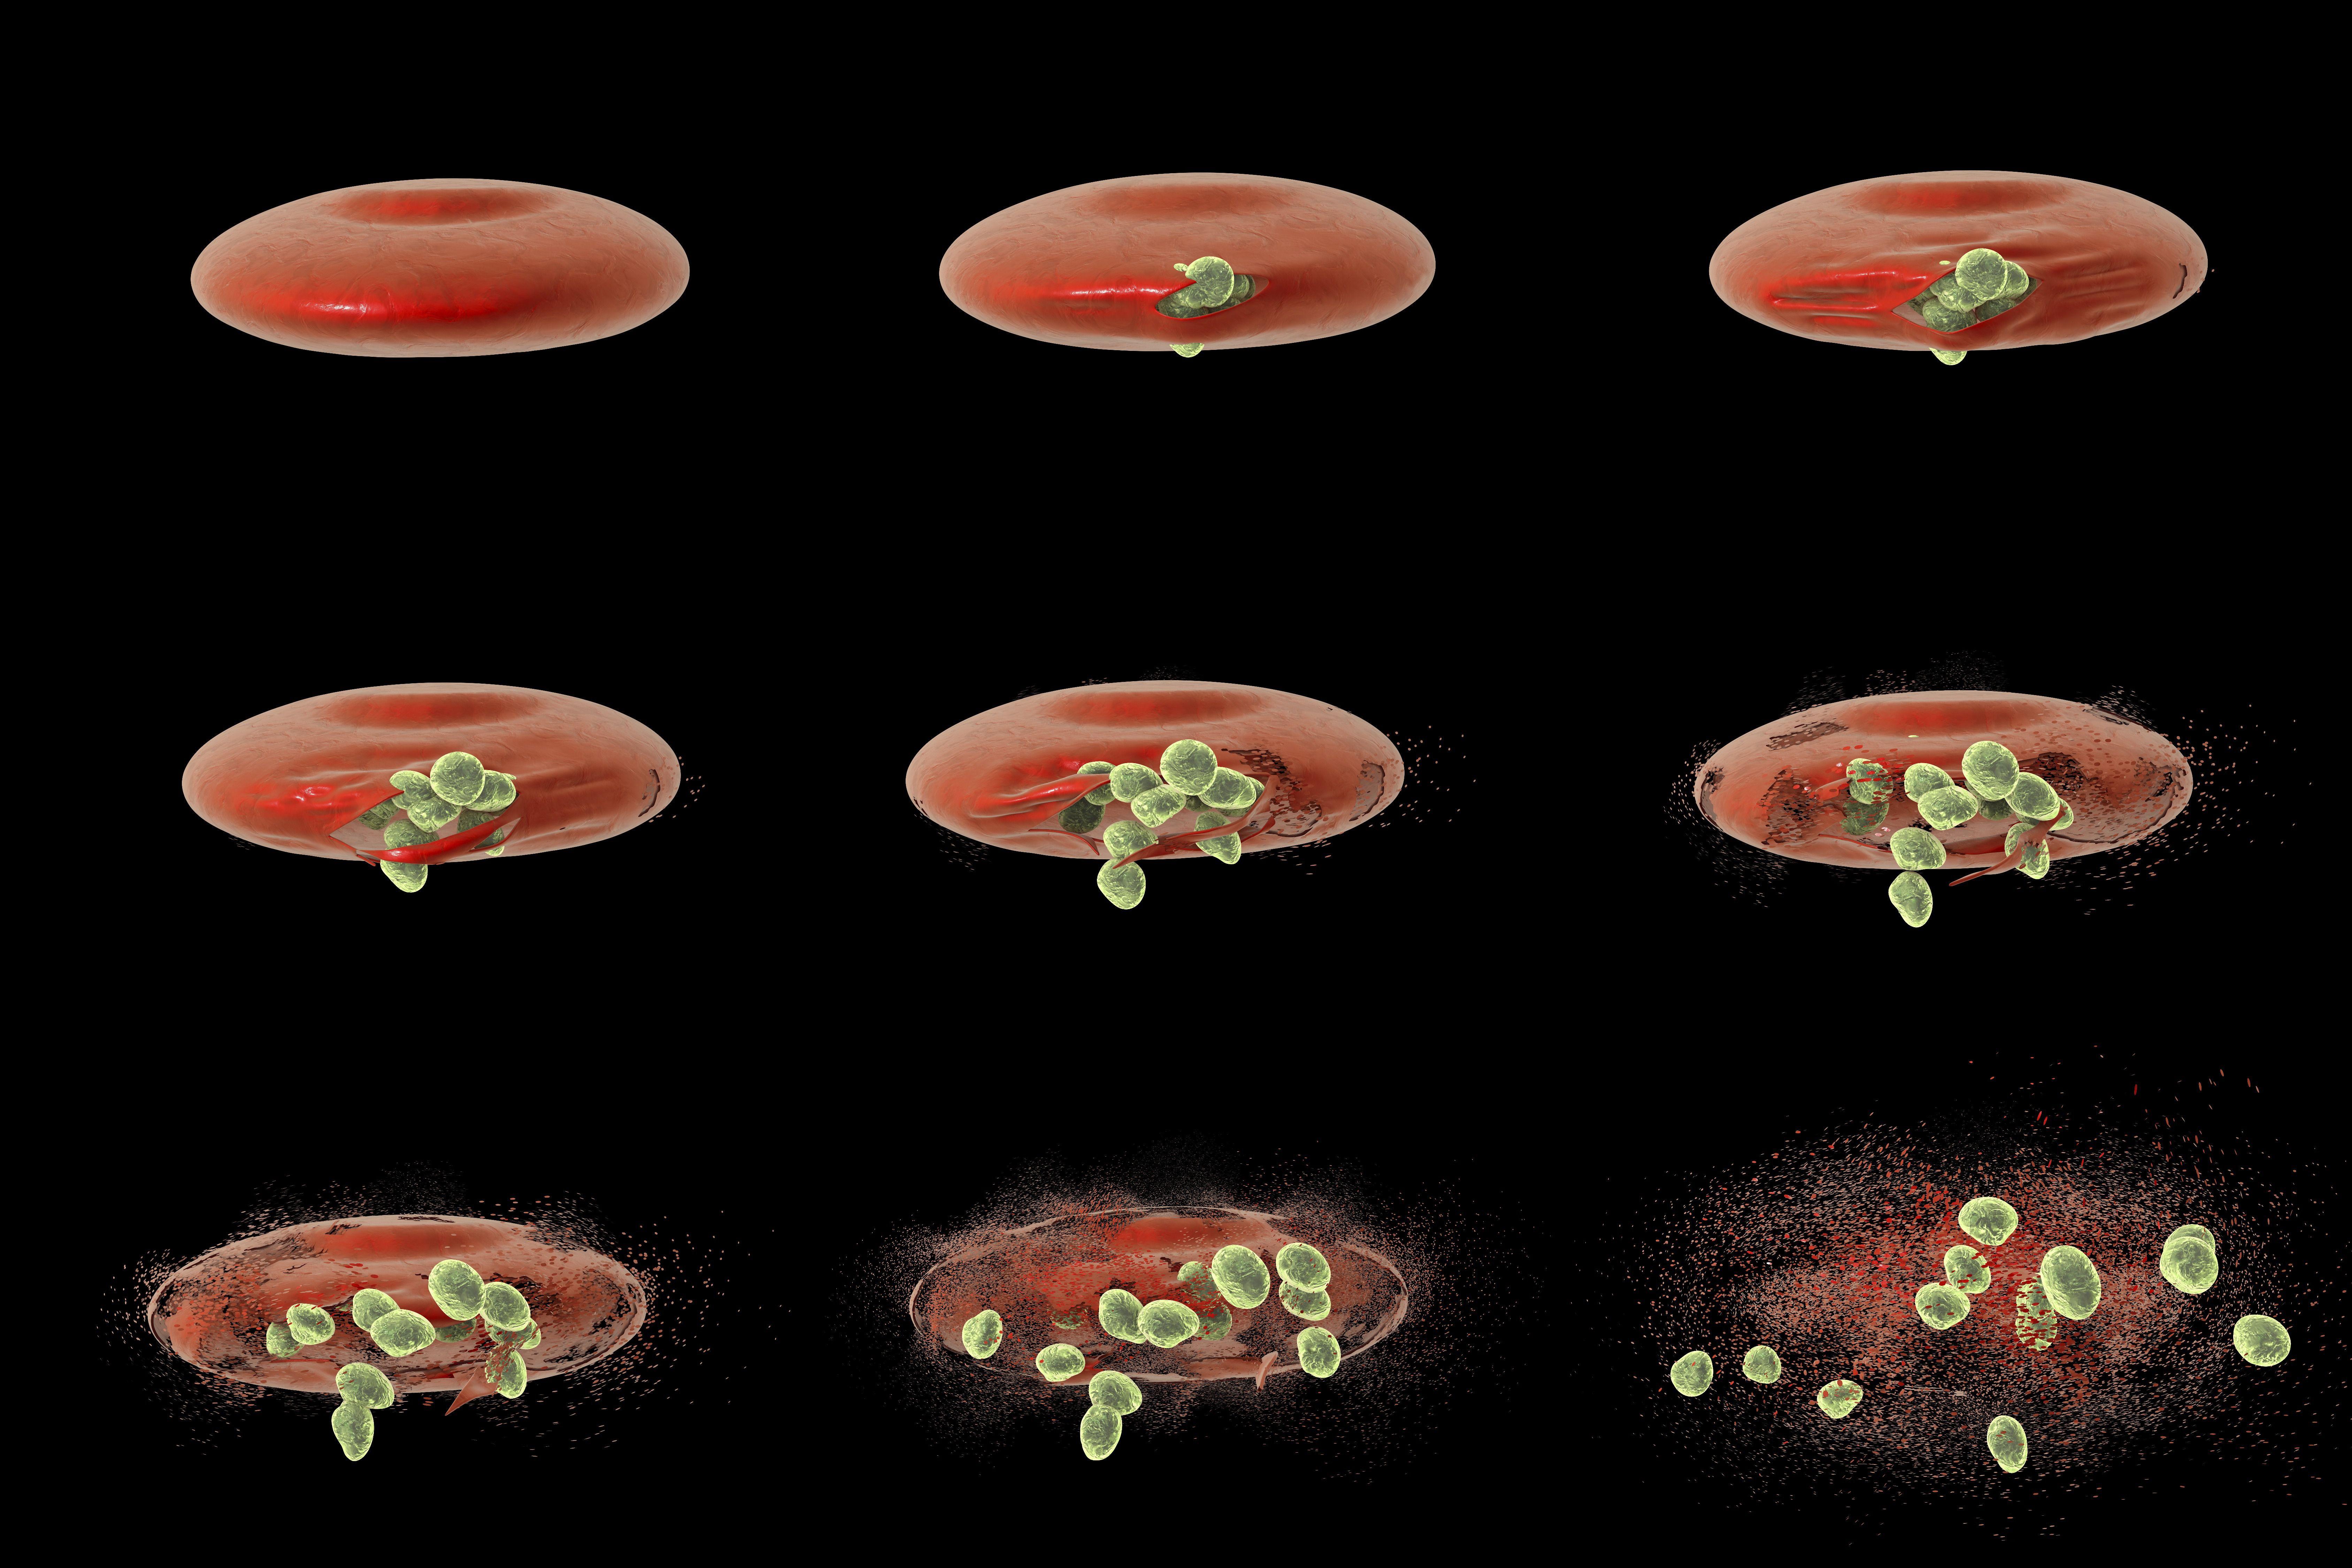 Malaria merozoites ultimately rupture red blood cells, dispersing more parasites